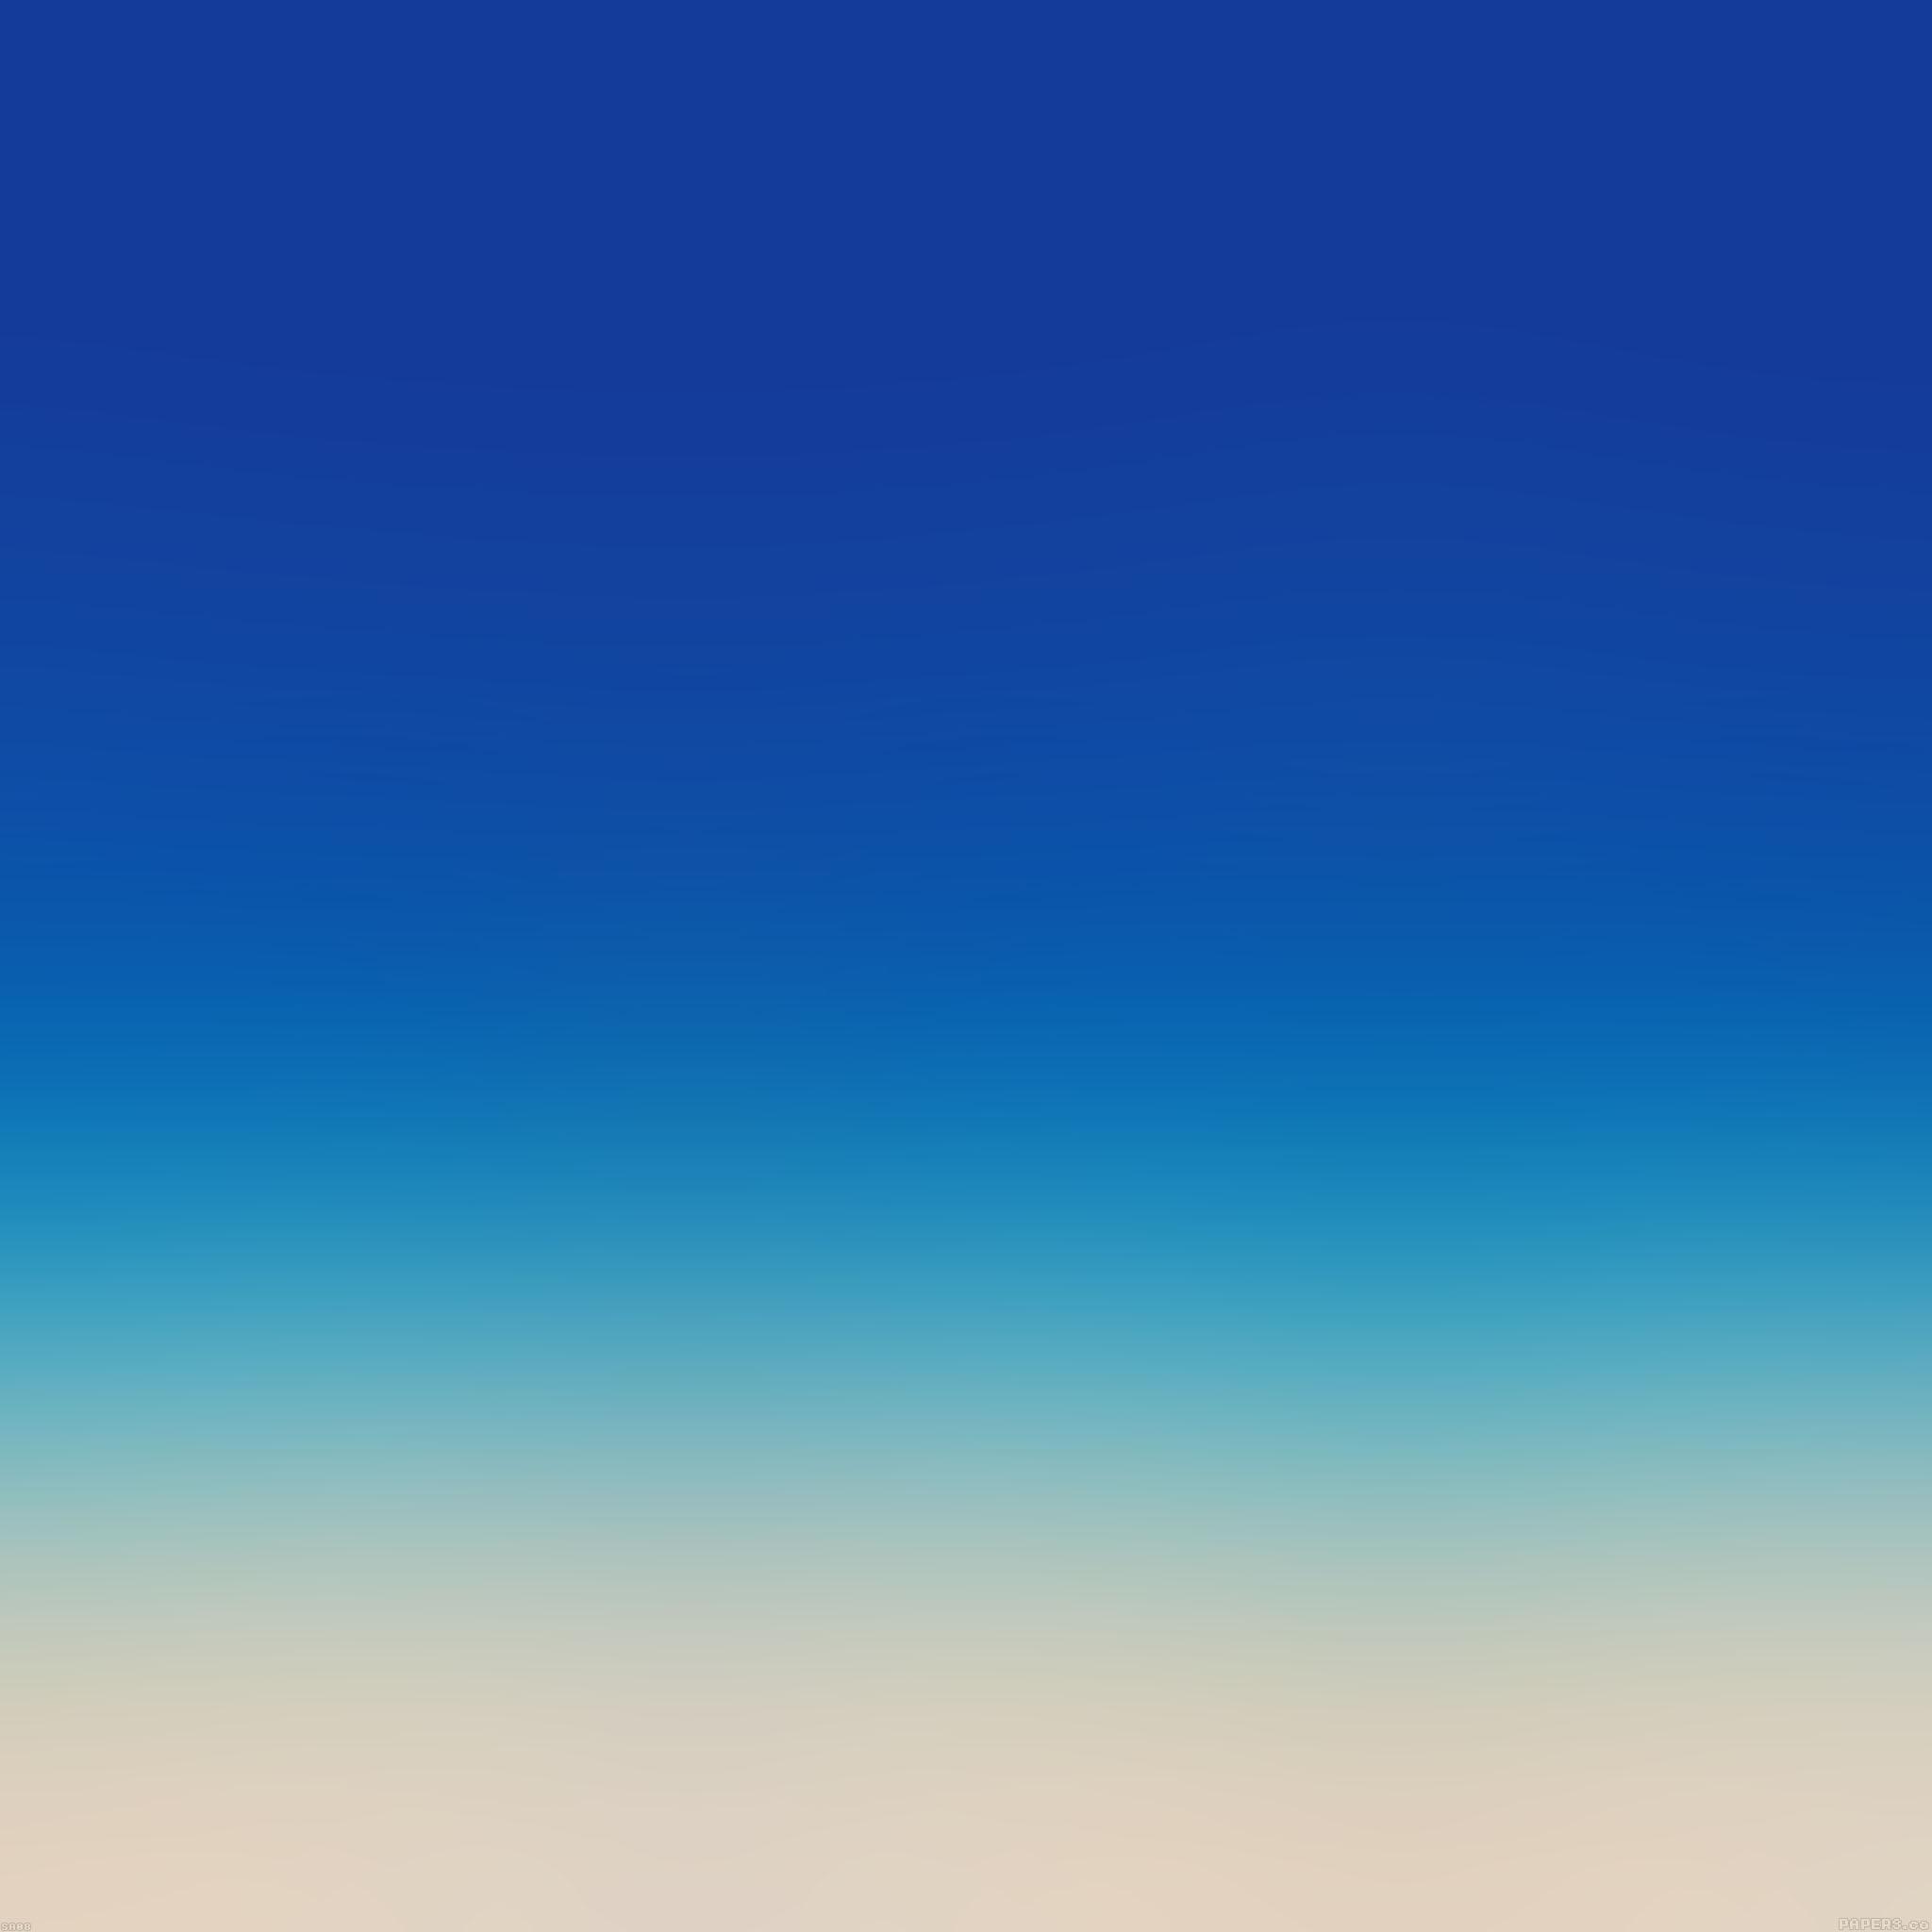 Sa08 Blue Sky Blue Blur Wallpaper